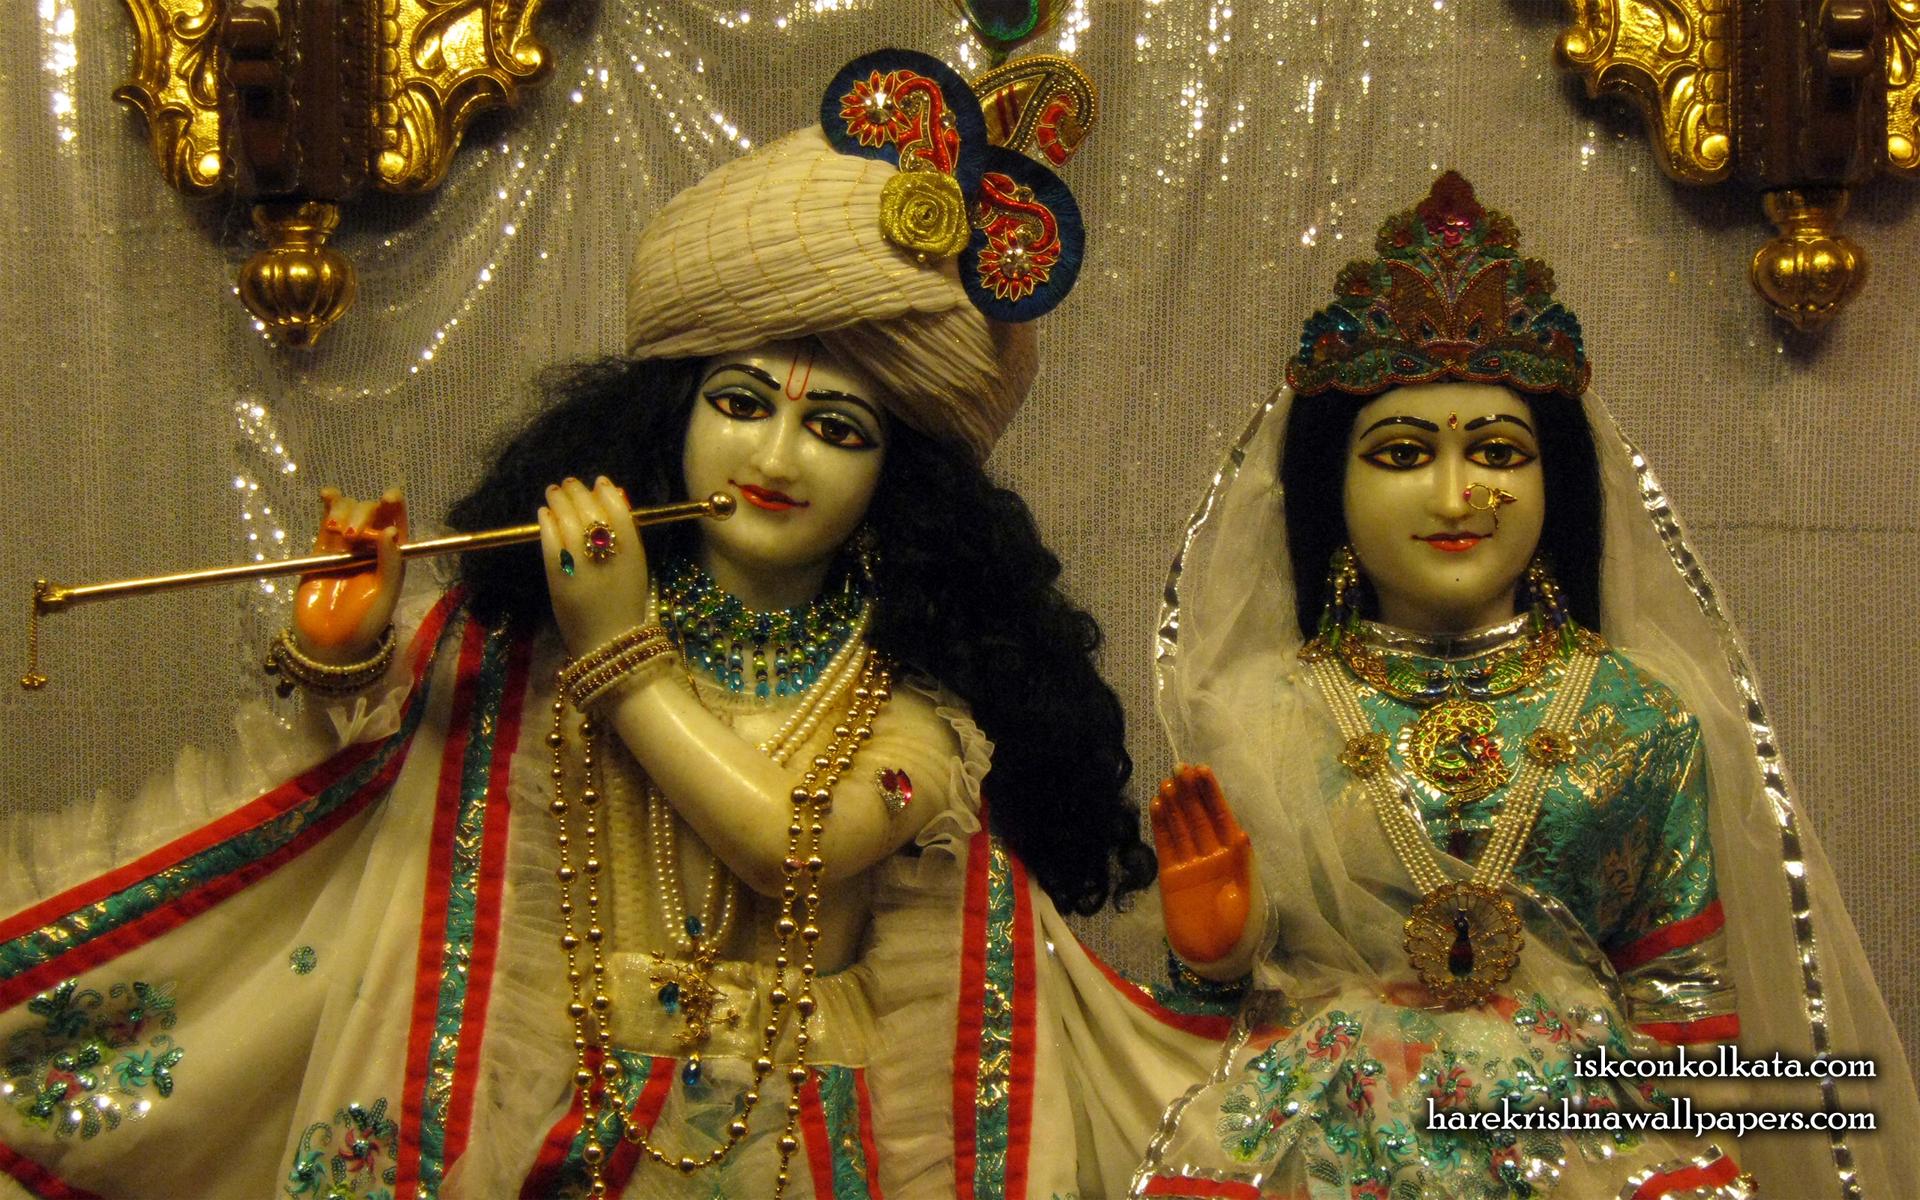 Sri Sri Radha Govinda Close up Wallpaper (003) Size 1920x1200 Download